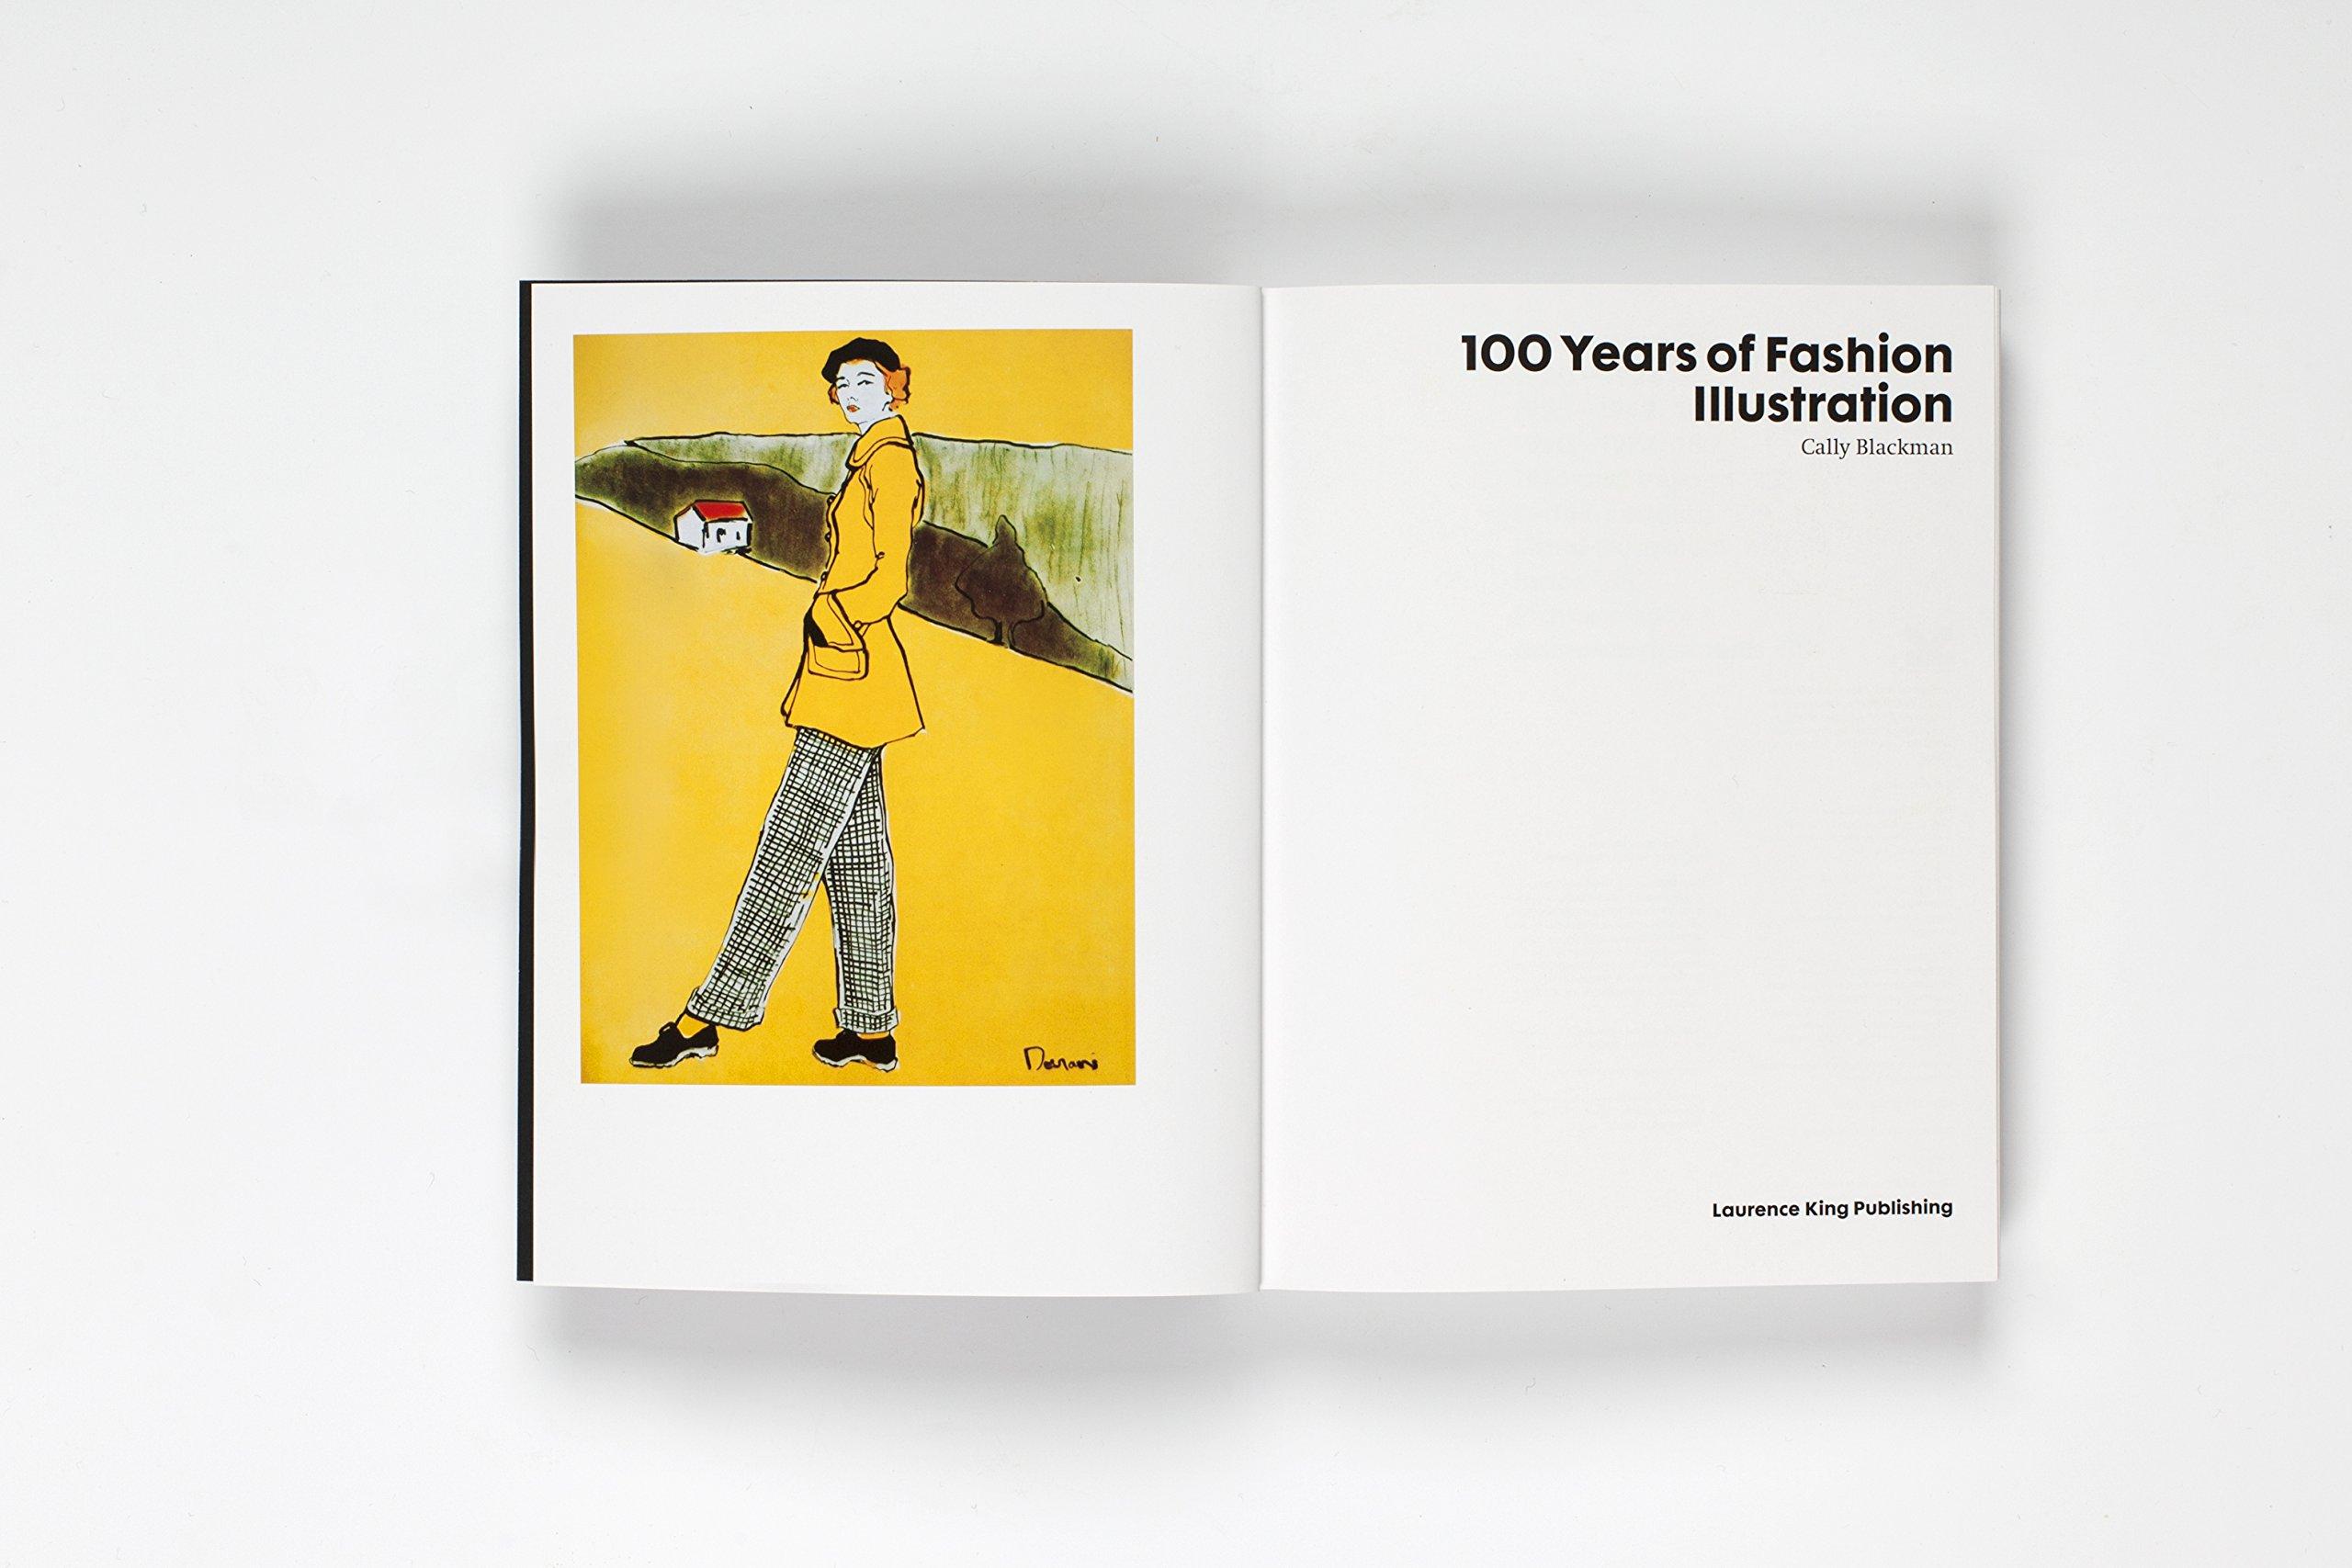 100 Years of Fashion Illustration 2